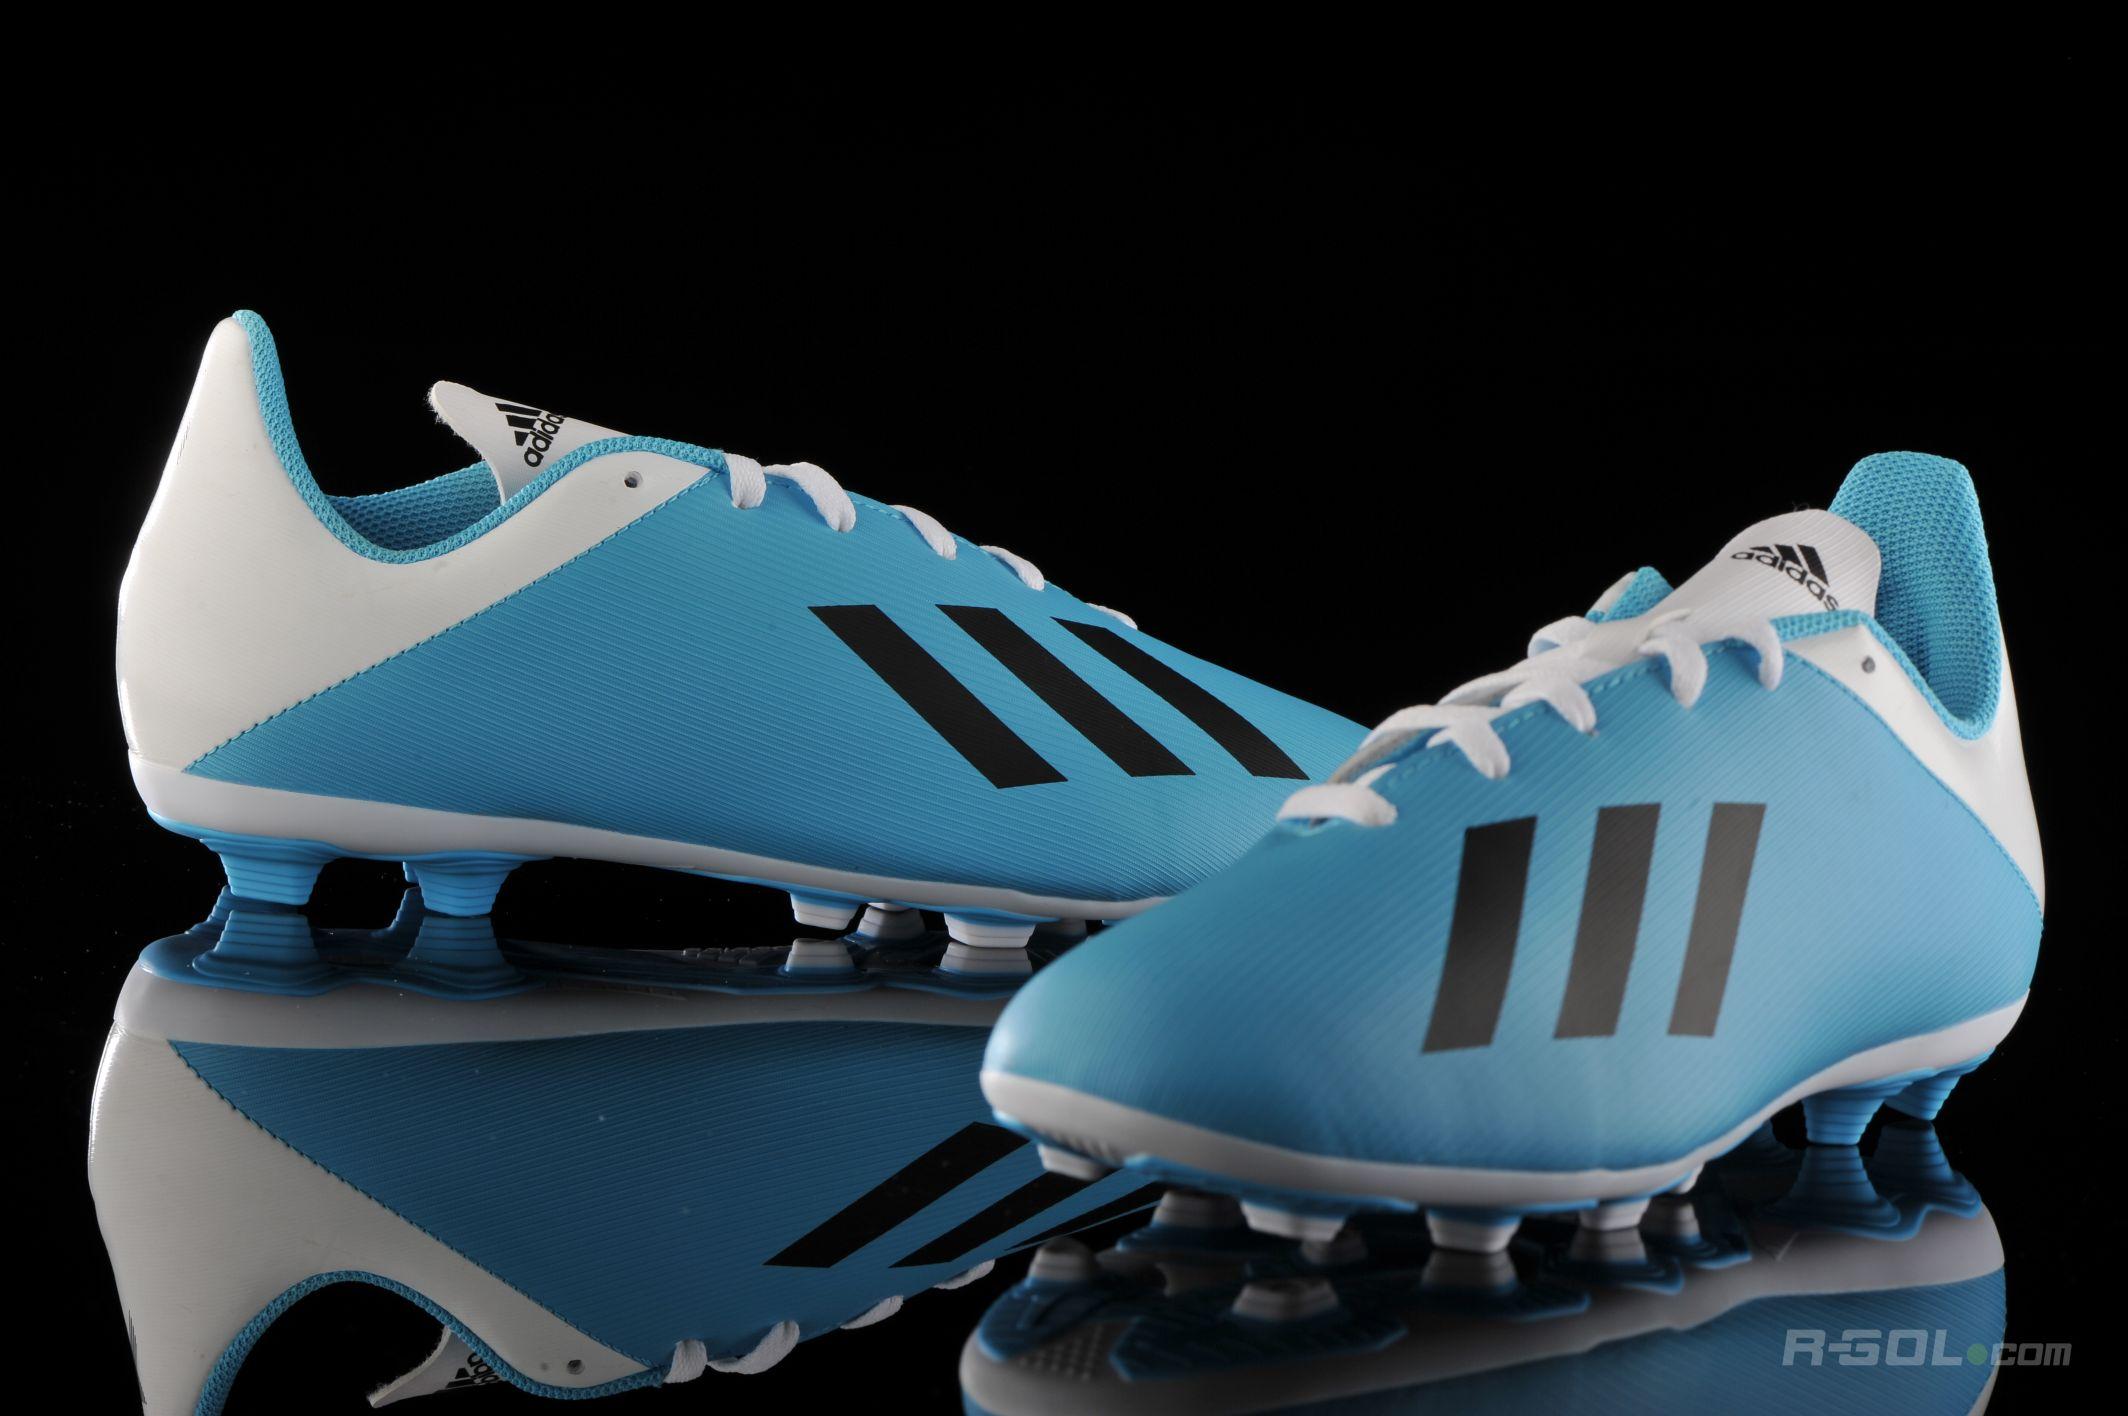 Diventare freddo Obbedienza Registrati  Adidas X 19.4 Firm Ground Junior Football Boots